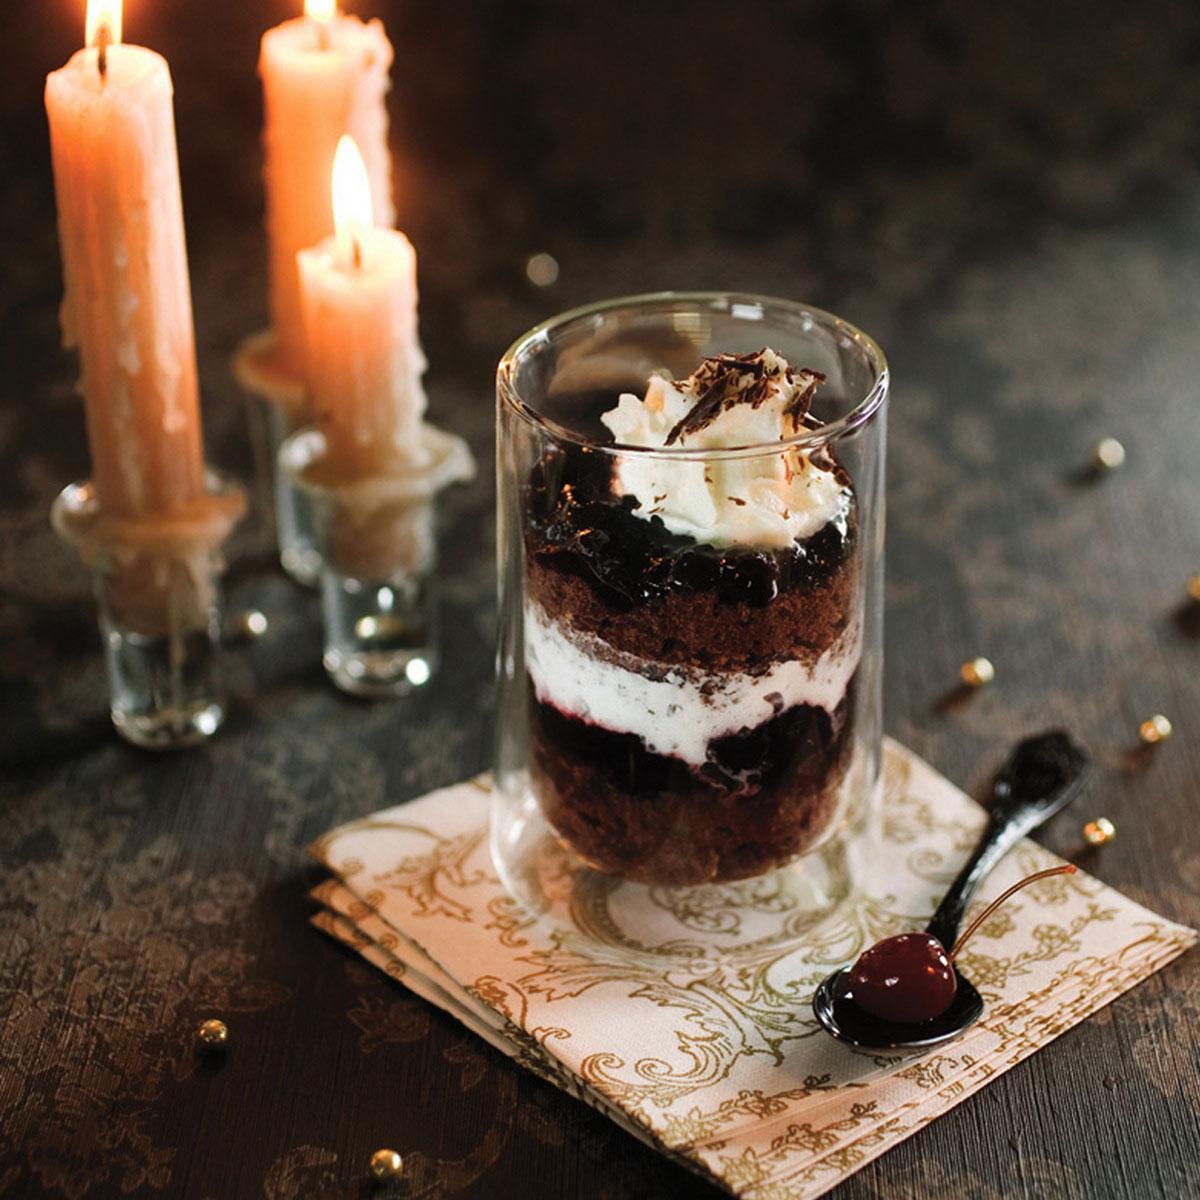 Recette for t noire new look cuisine madame figaro - Herve cuisine foret noire ...